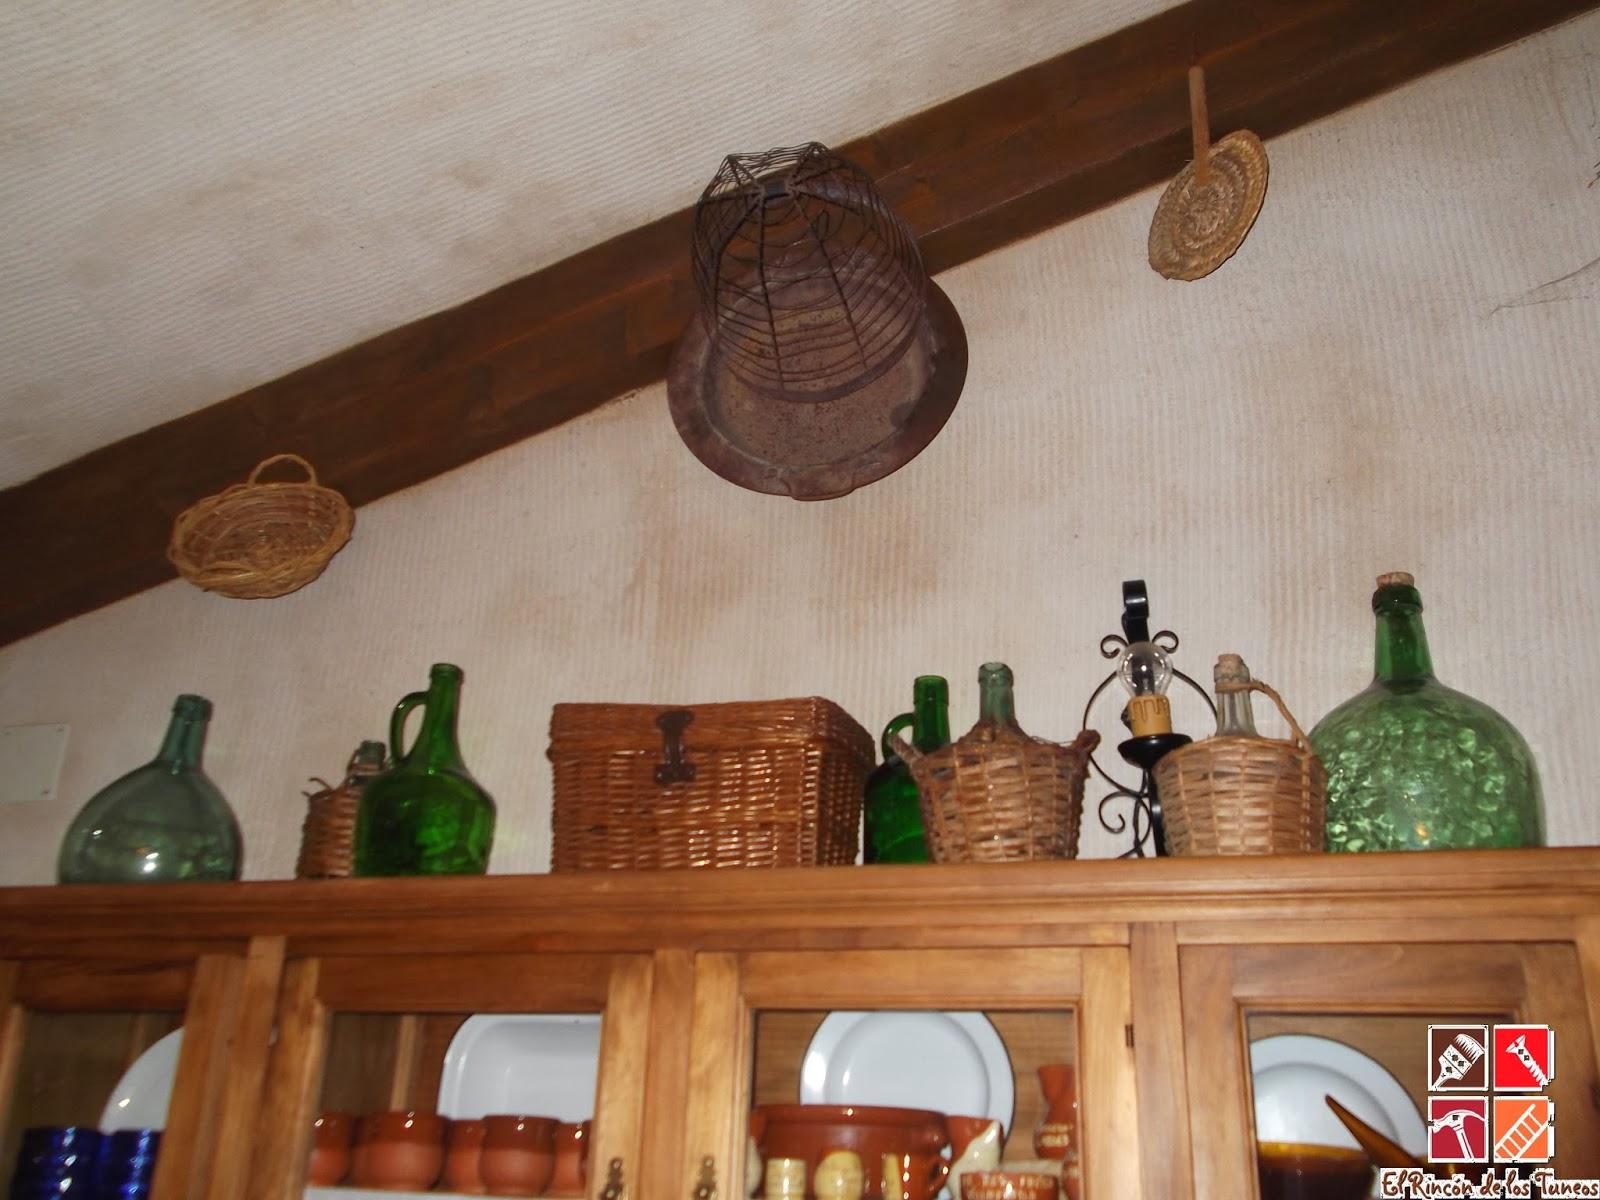 cestas de mimbre decorativas